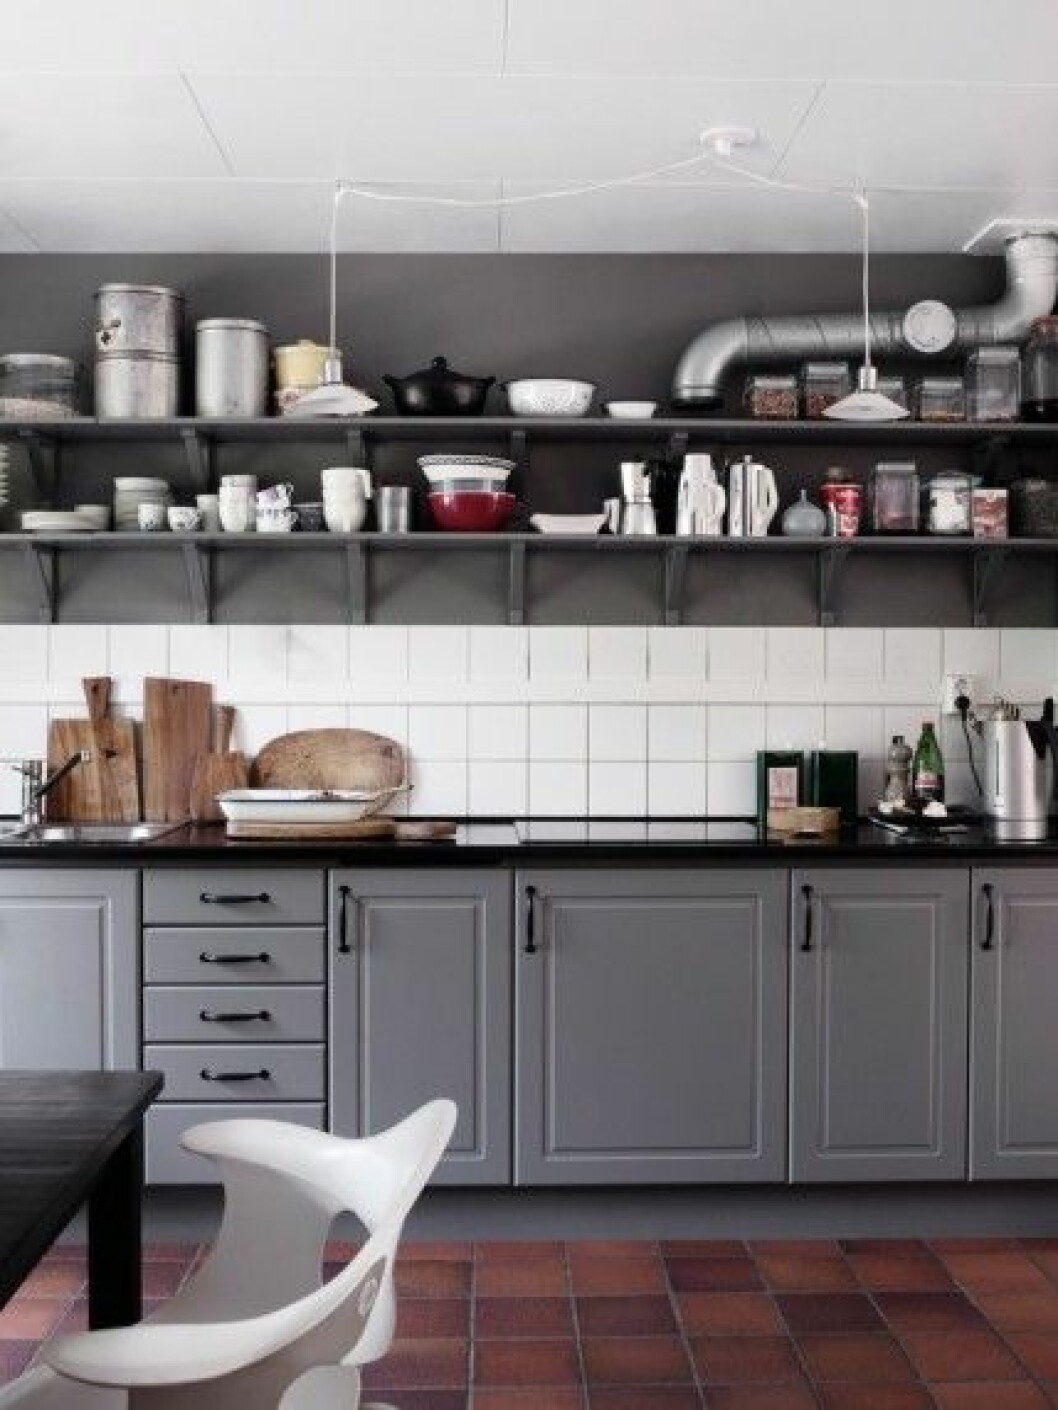 grått-kök-öppna-hyllor-vitt-kakel-foto-anna-kern